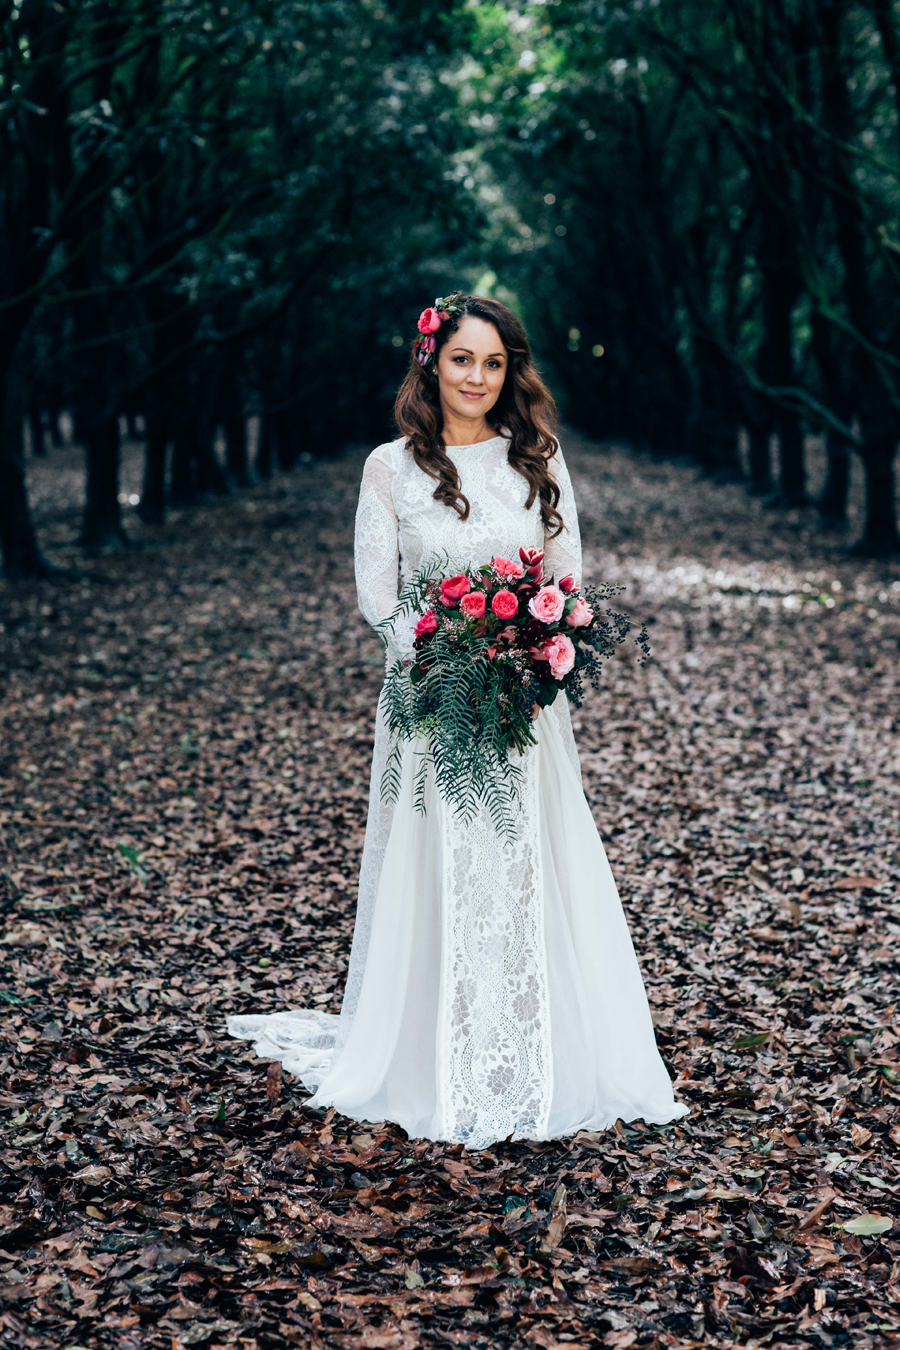 Photo // Figtree Wedding Photography